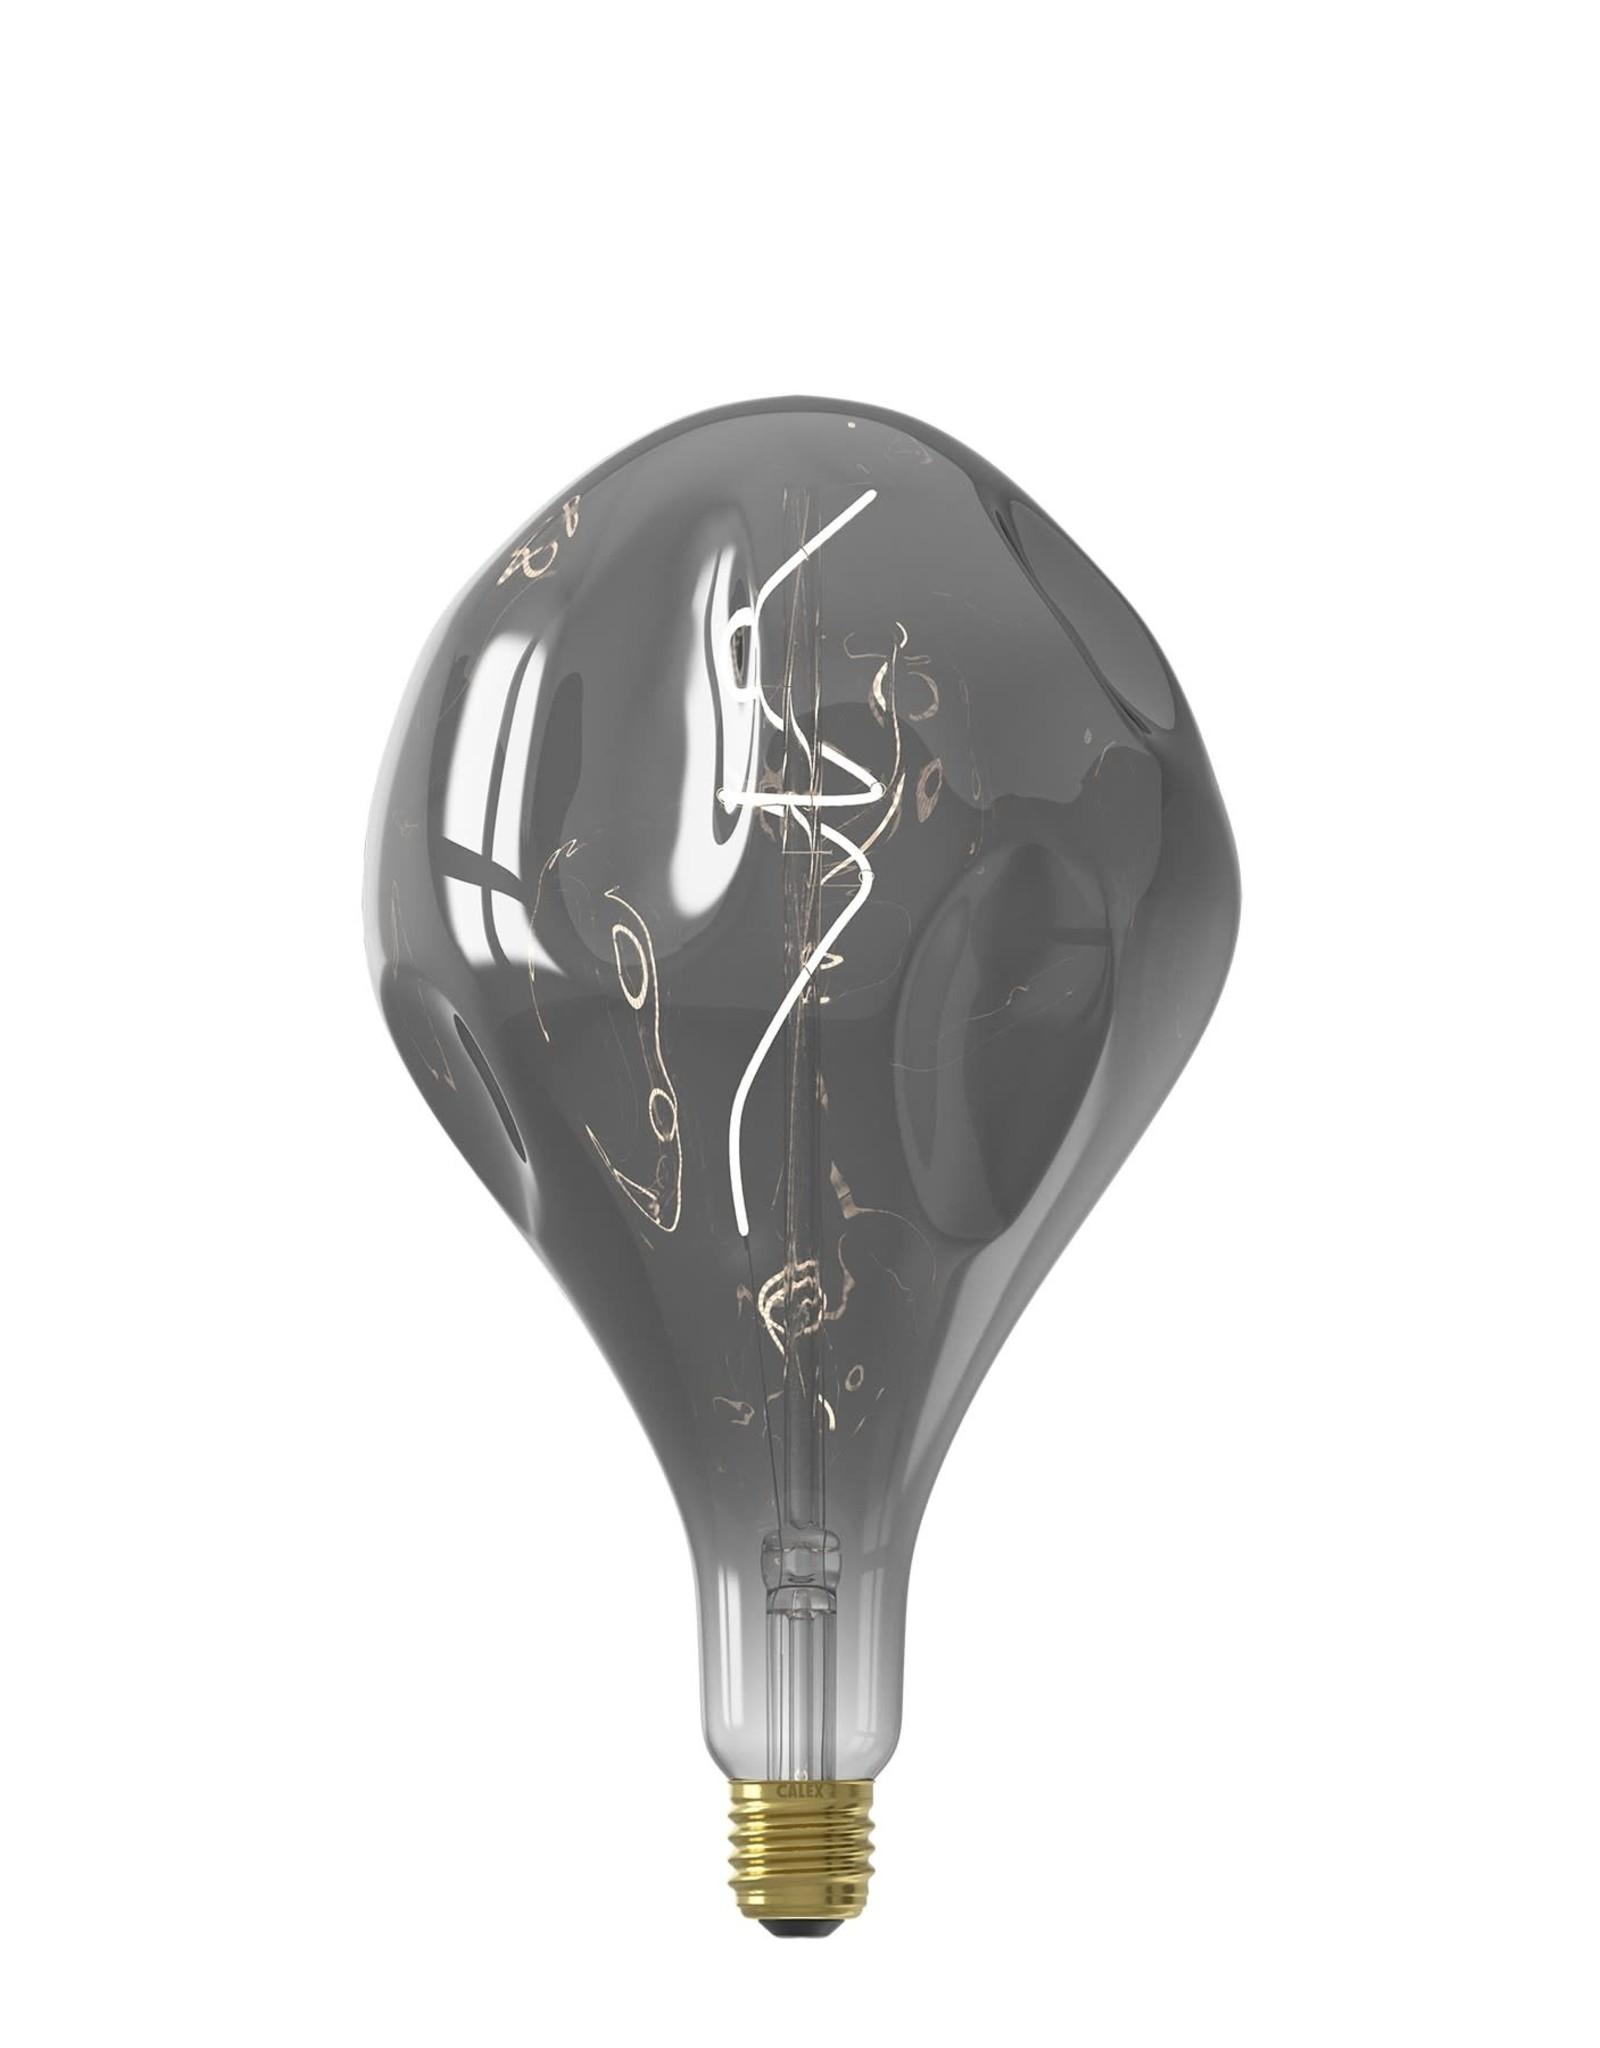 Calex XXL Organic EVO LED Lamp 220-240V 6W 130lm E27 PS165, Titanium 2100K dimmable, energy label B